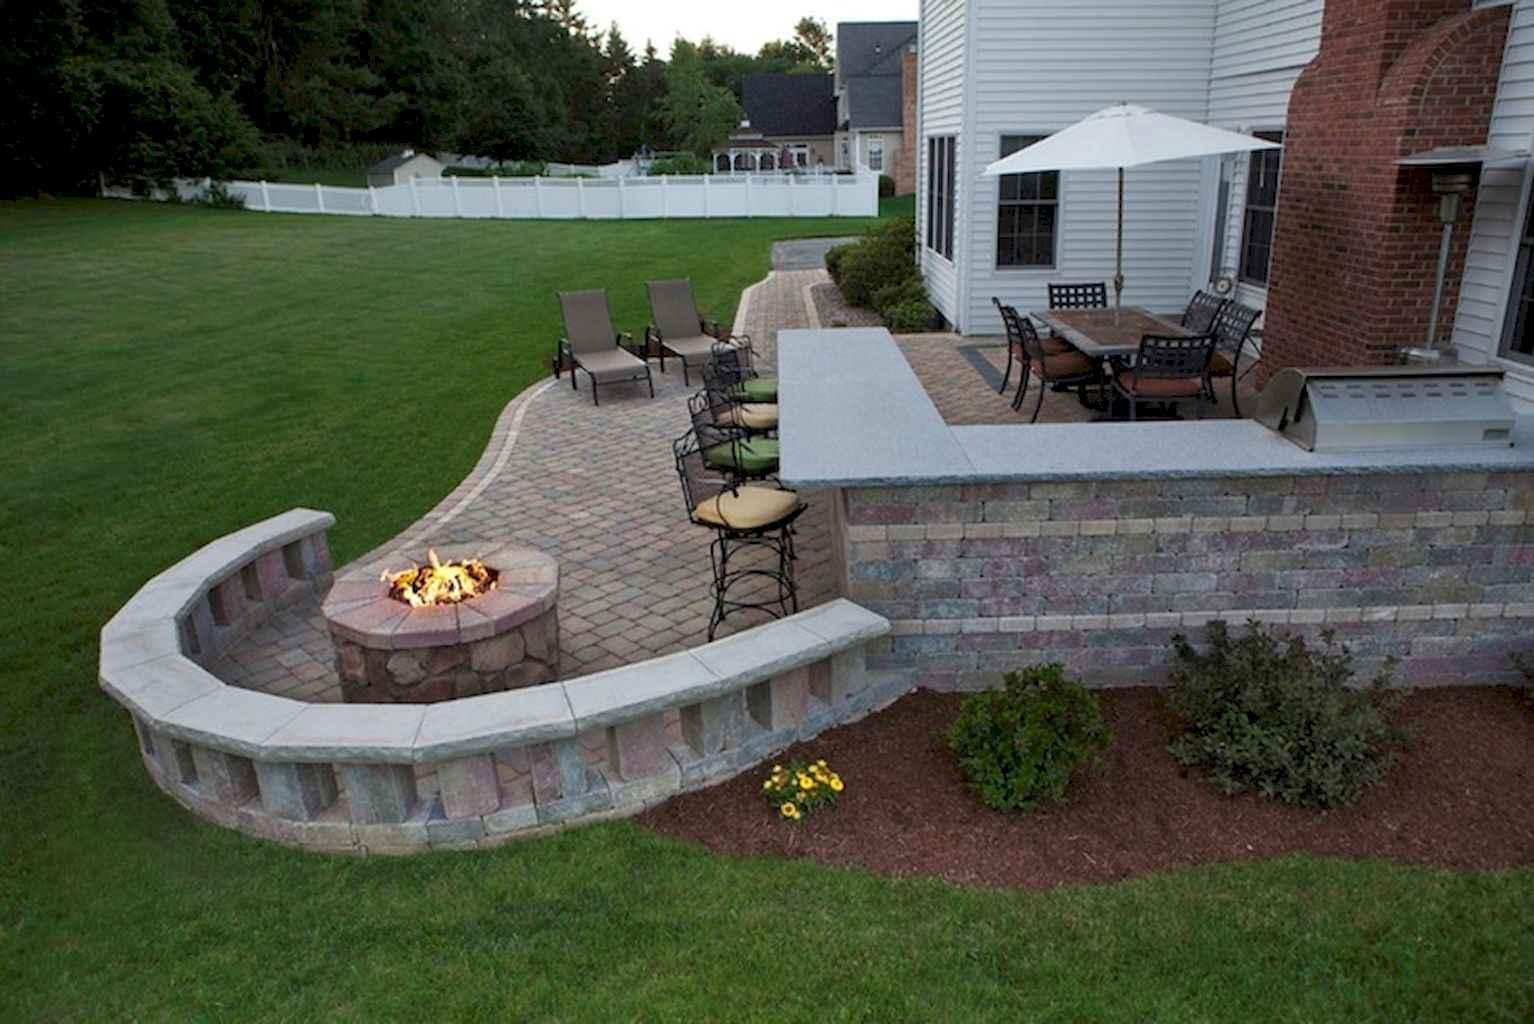 60 Beautiful Backyard Fire Pit Ideas Decoration and Remodel (50)